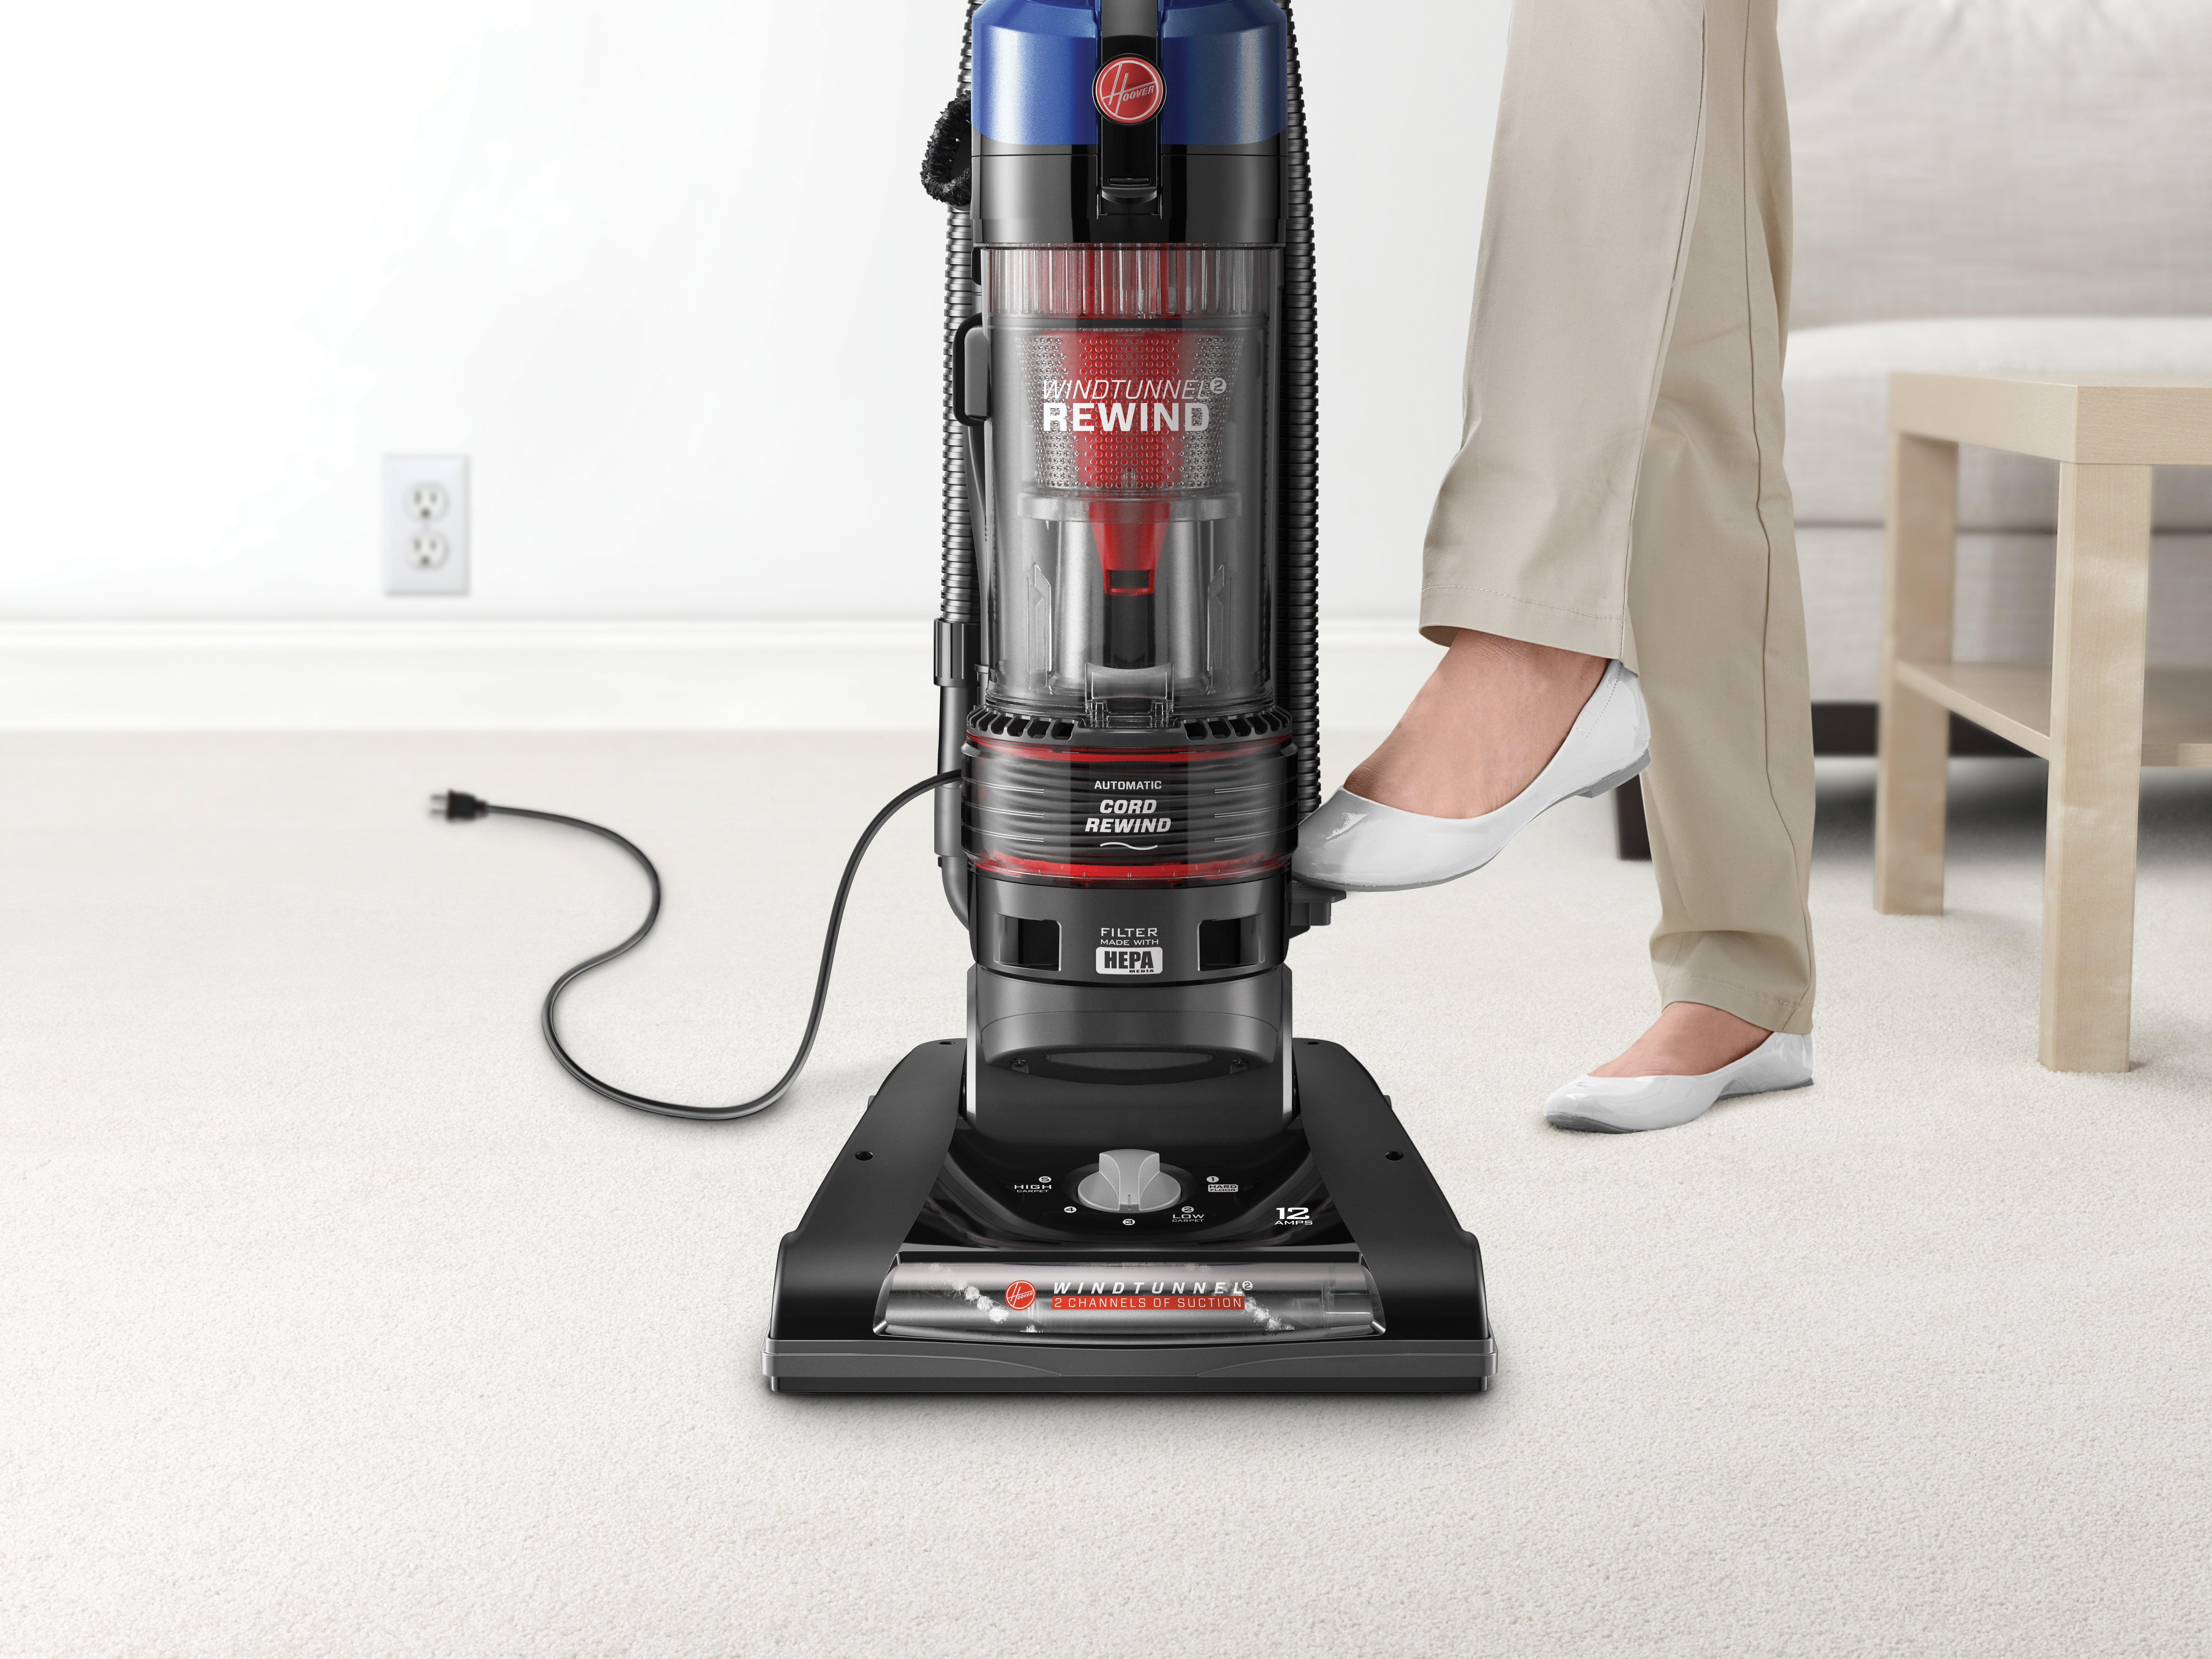 Hoover-WindTunnel-2-Rewind-Bagless-Upright-Vacuum-Cleaner-